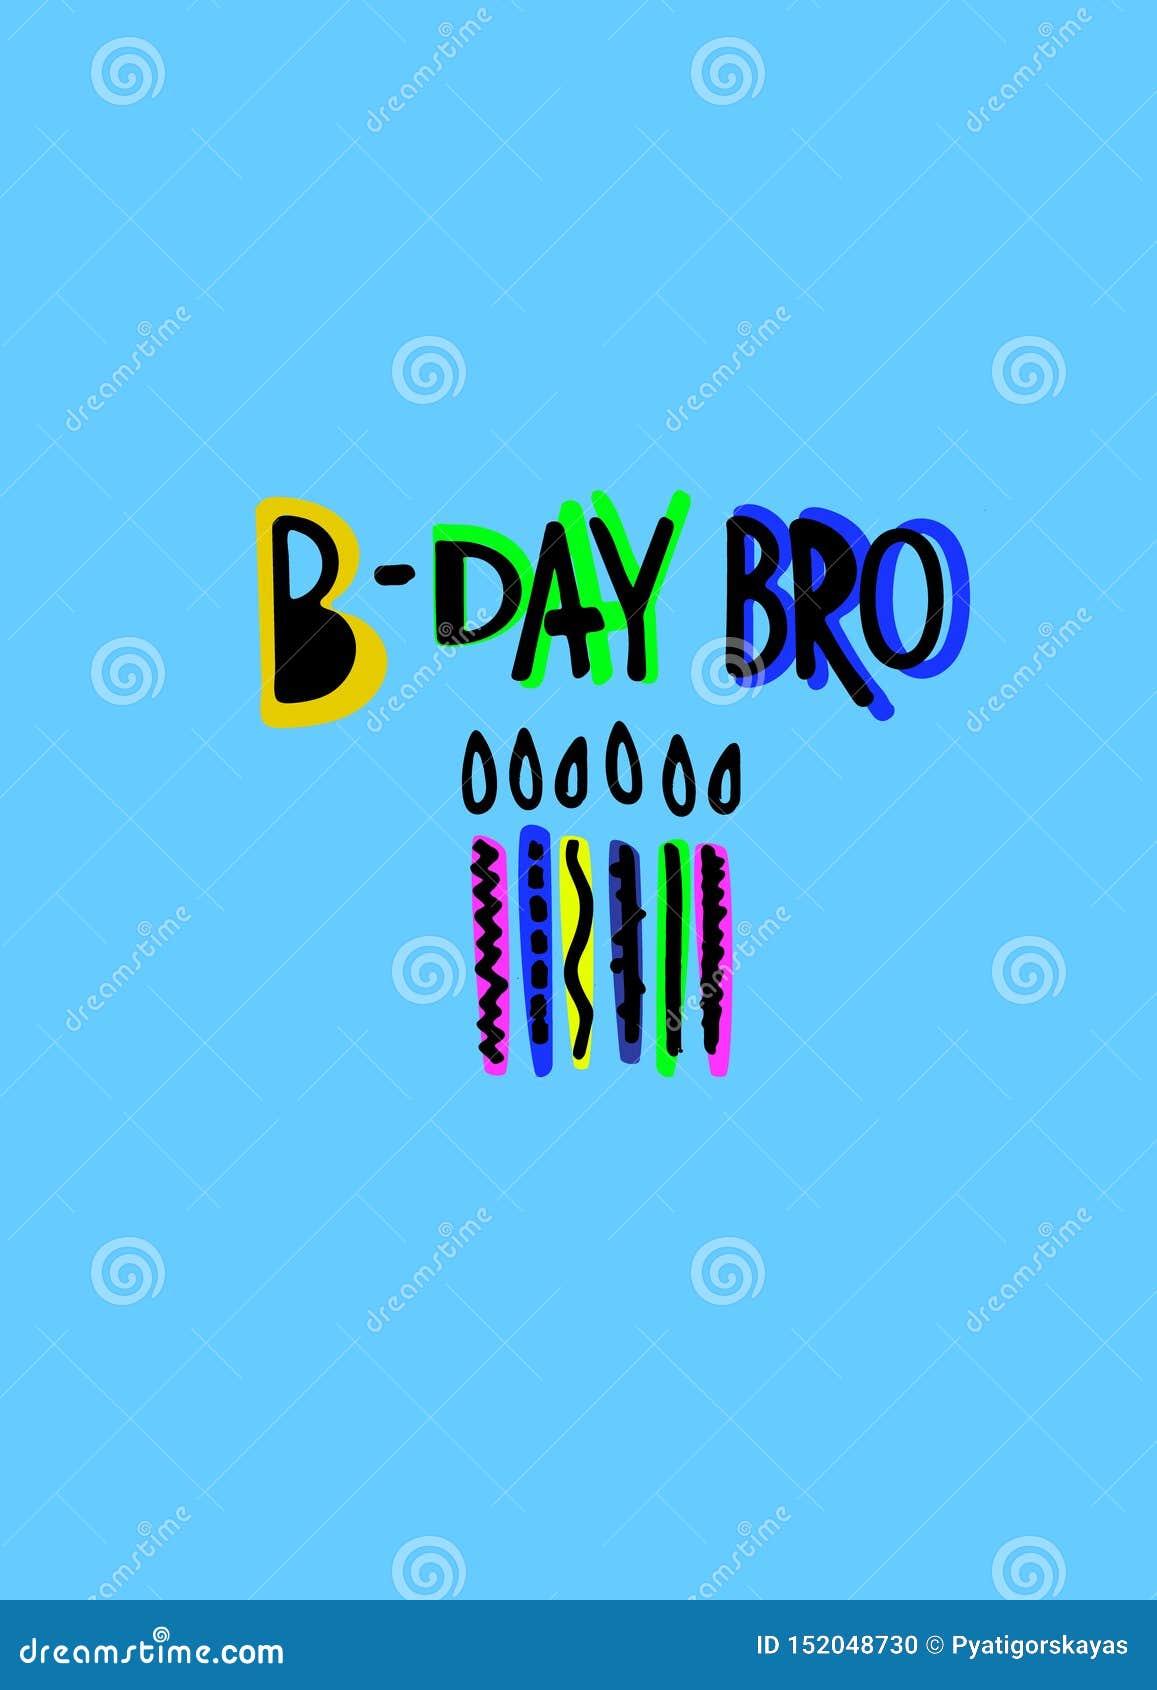 Cool Birthday Greeting Card For Boys Funny Cartoon Style